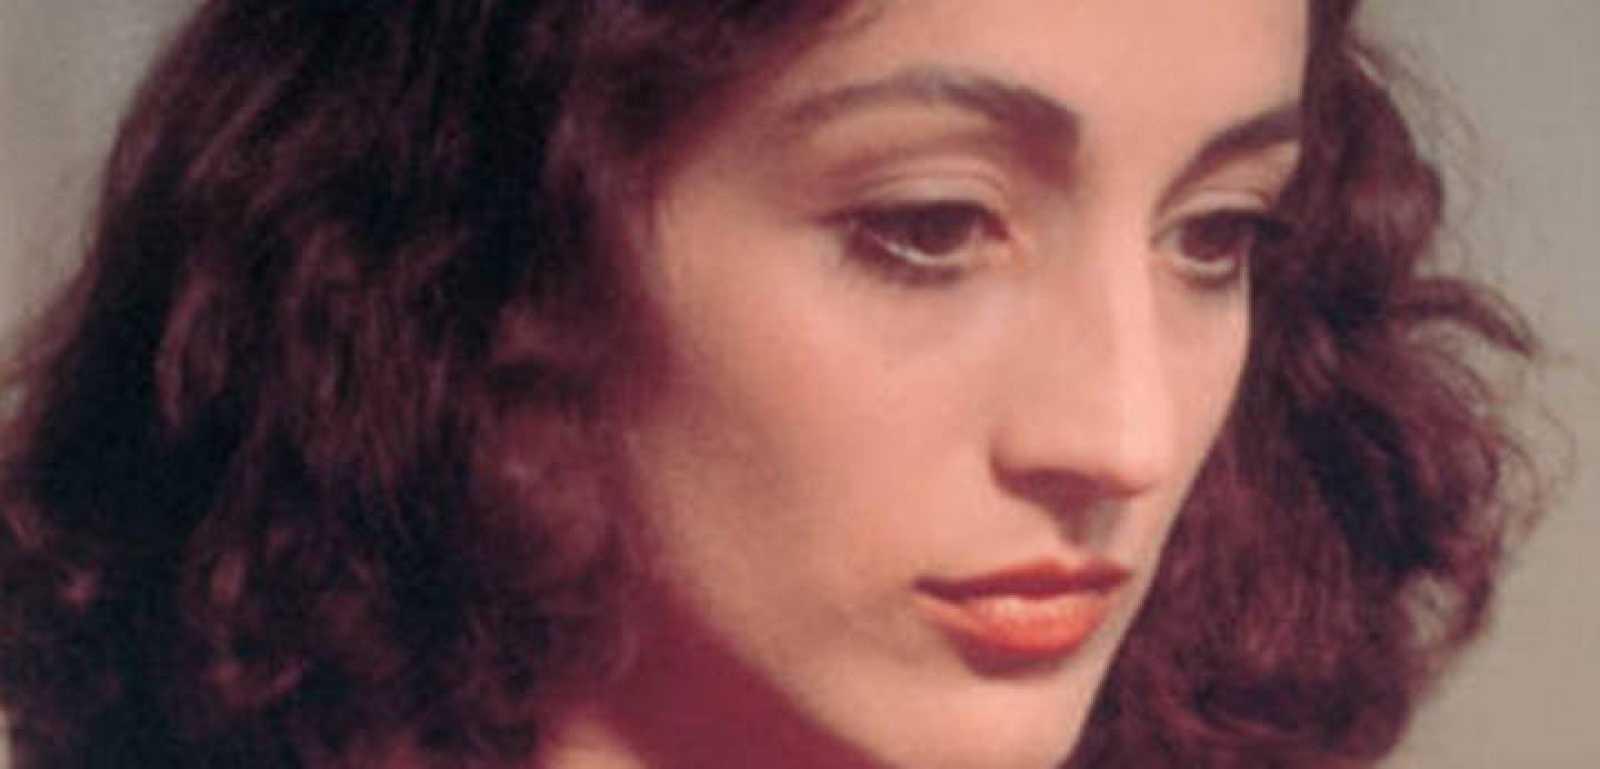 La actriz catalana Silvia Munt, en el papel de Natalia/Colometa